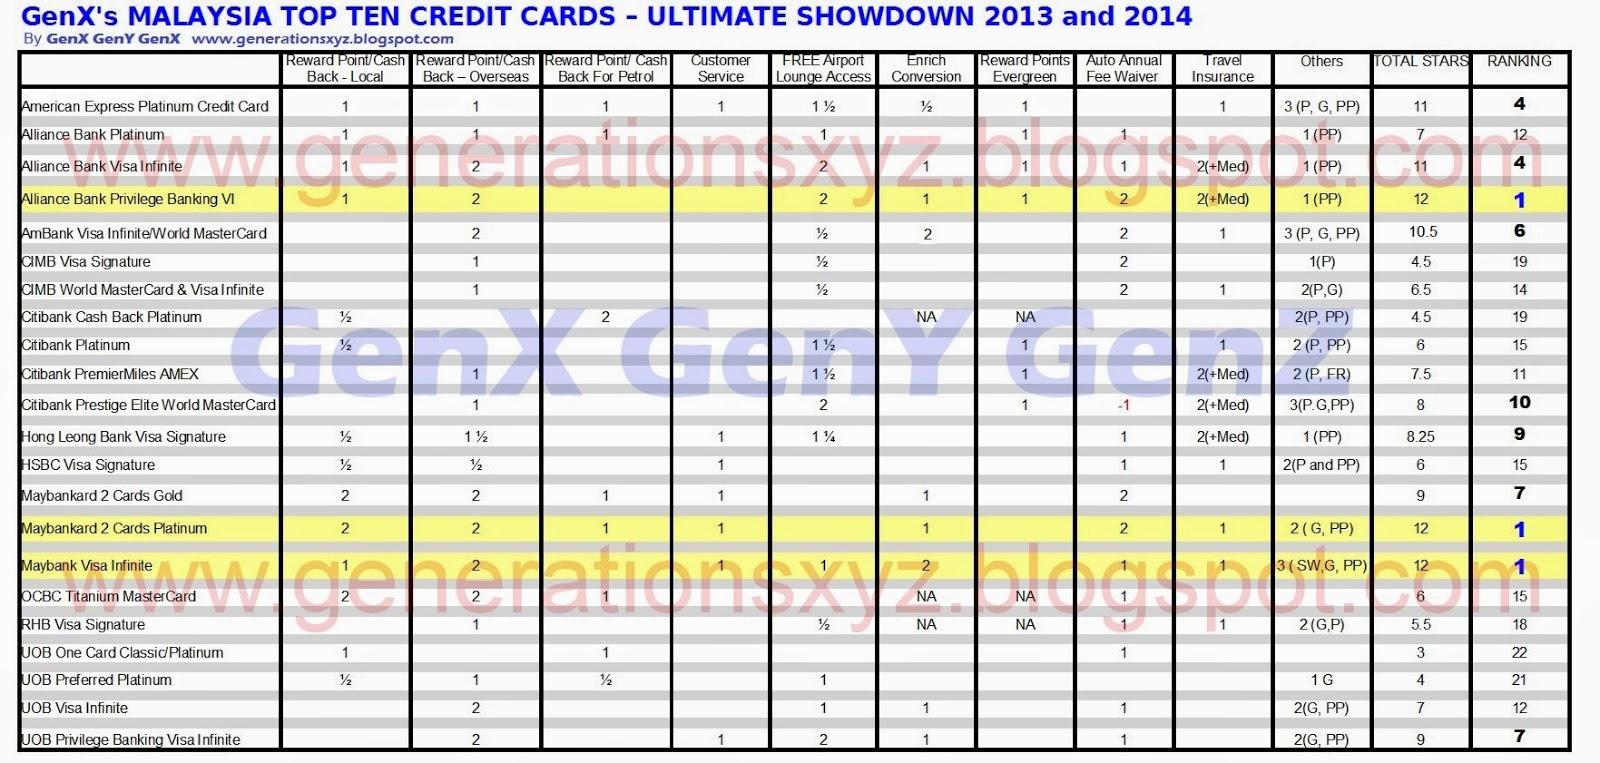 Malaysia top 10 credit card 2014 oh malaysia top 10 credit card 2014 malaysia top 10 credit card 2014 oh malaysia top 10 credit card 2014 reheart Gallery